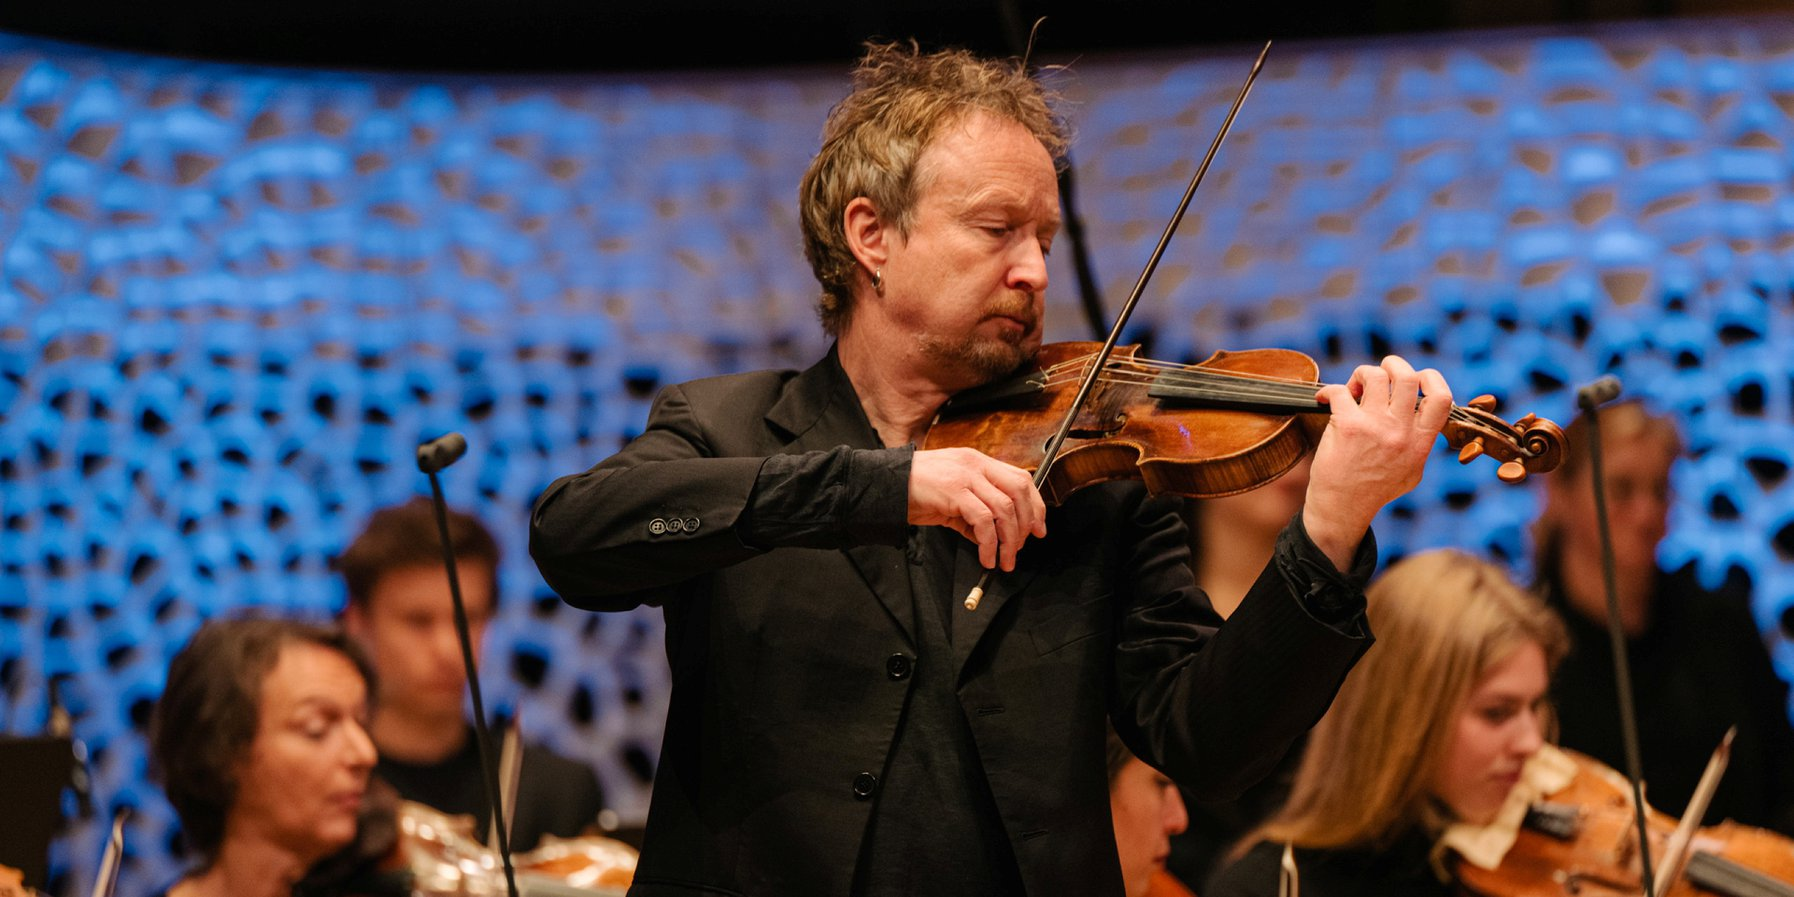 Violinist des Balthasar-Neumann-Ensembles